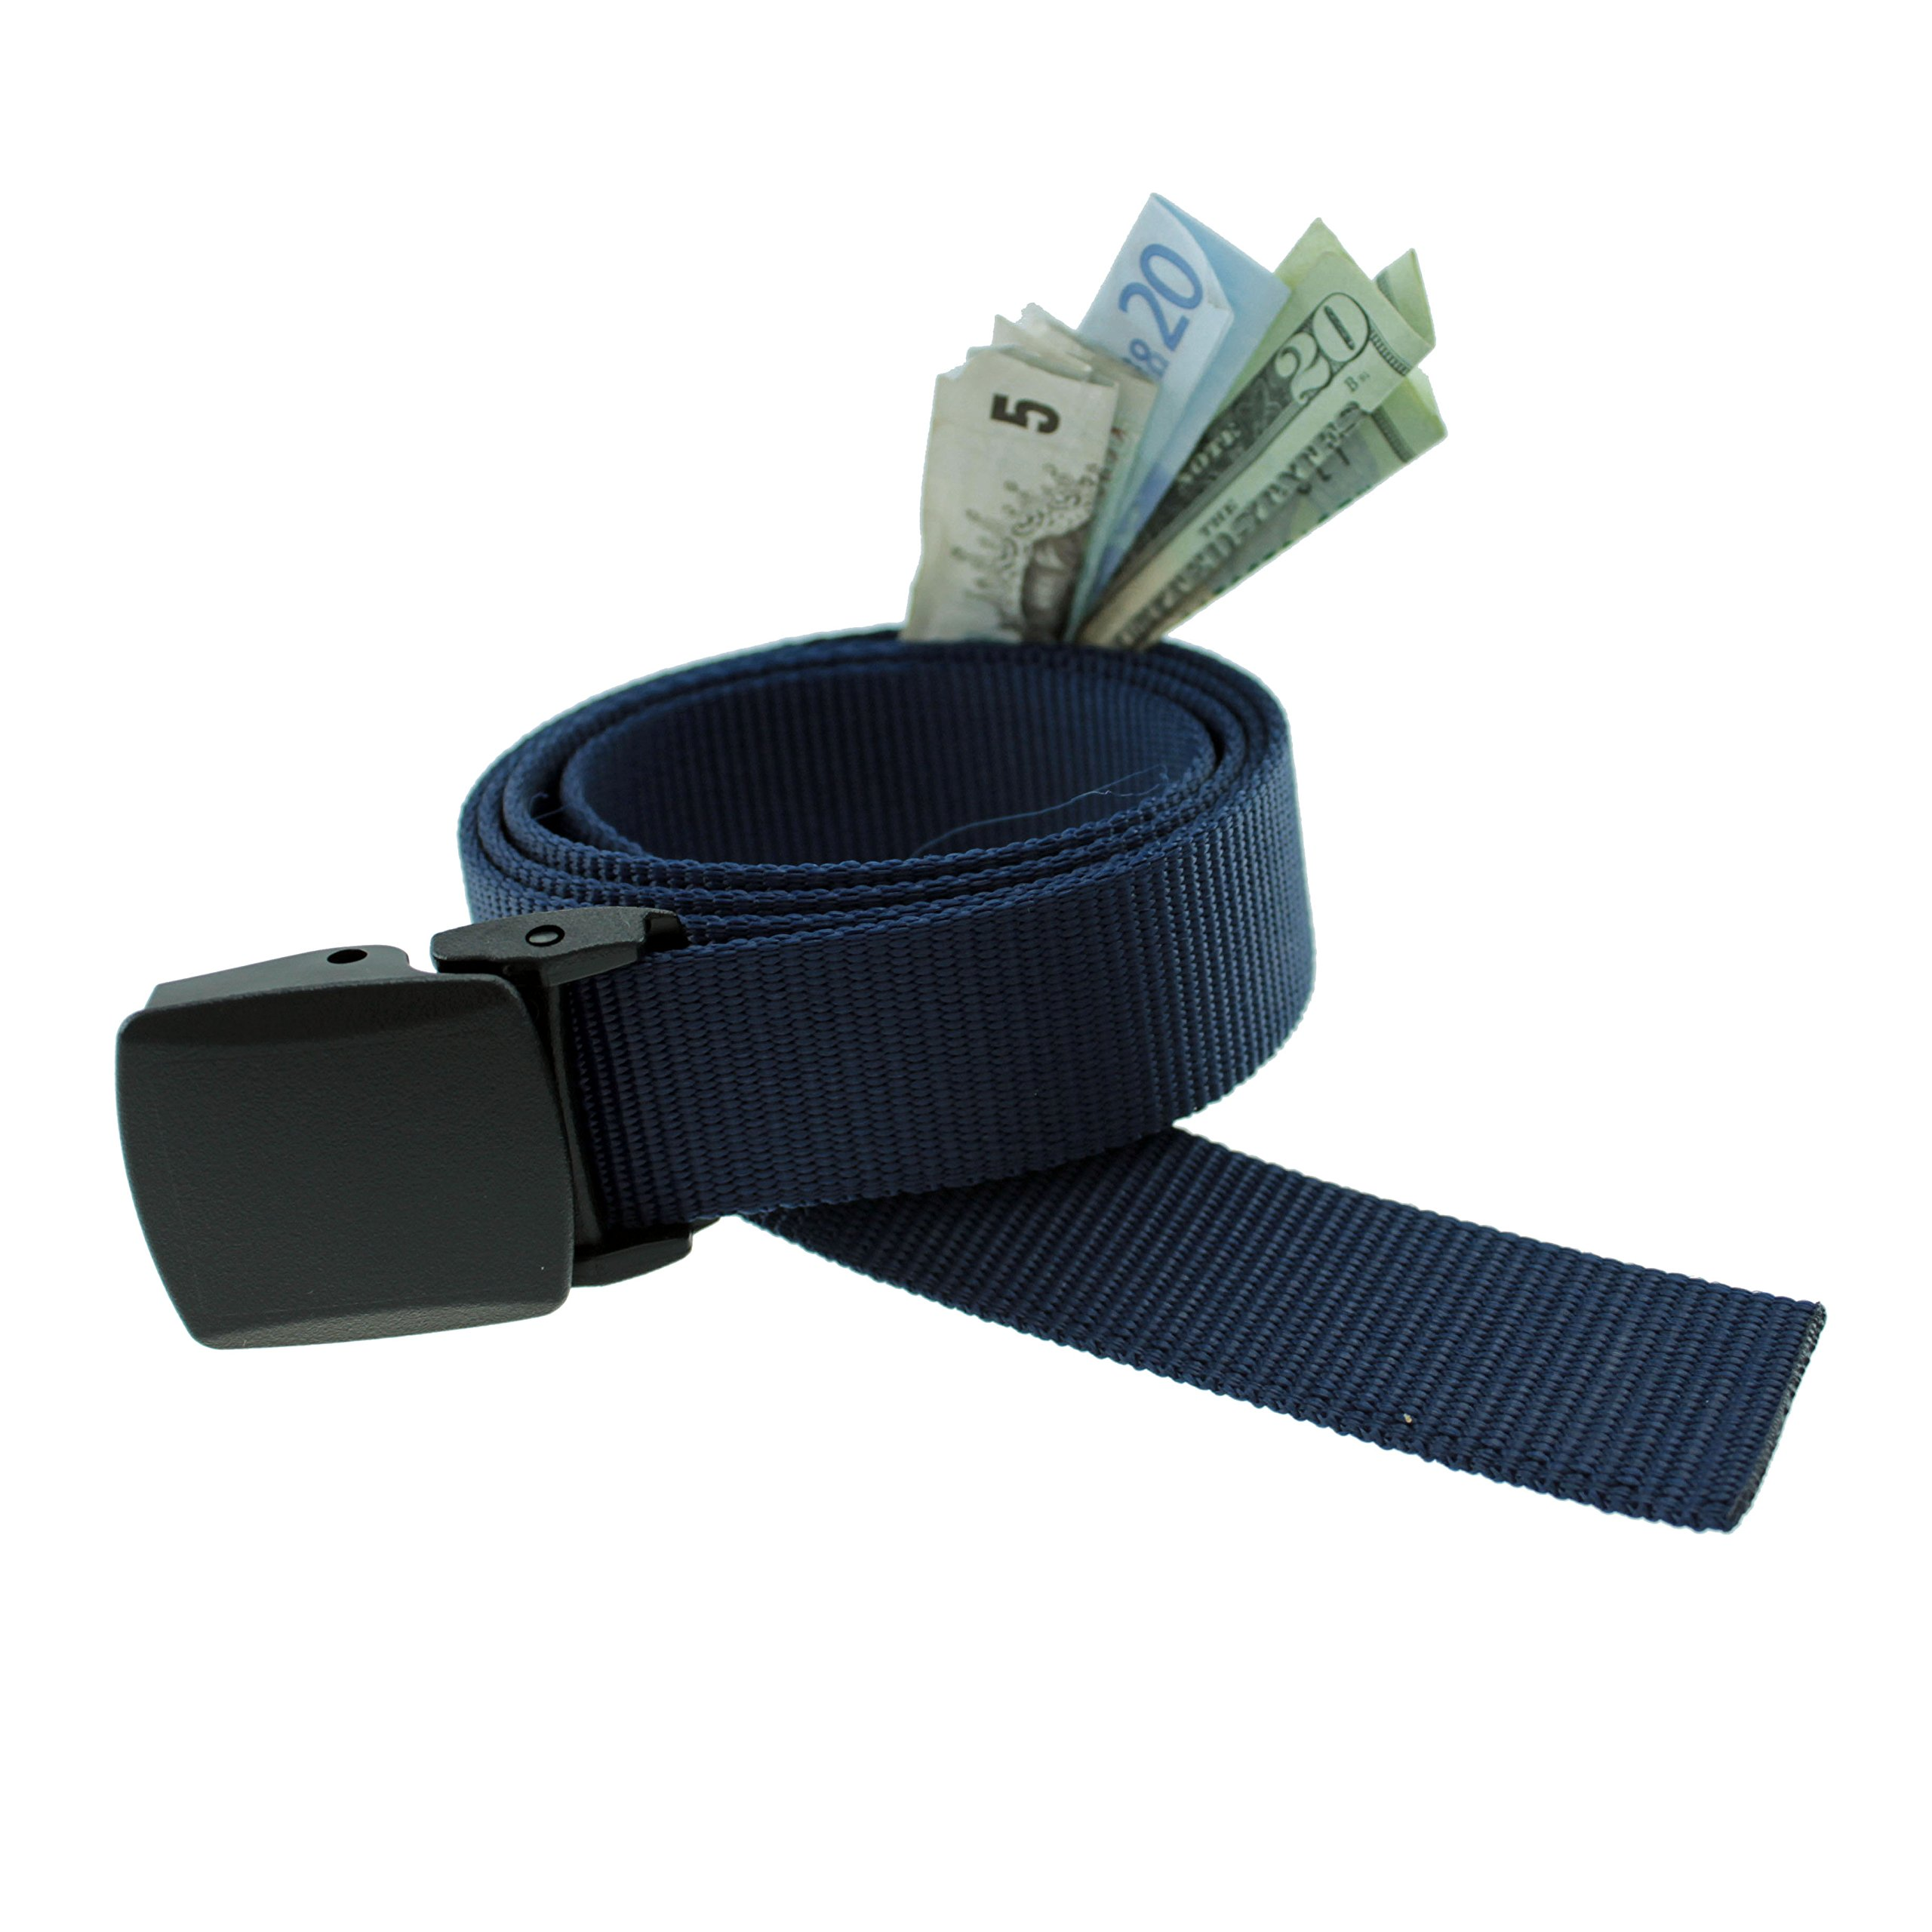 Trekker Money Belt made in USA by Thomas Bates (AS, Navy)